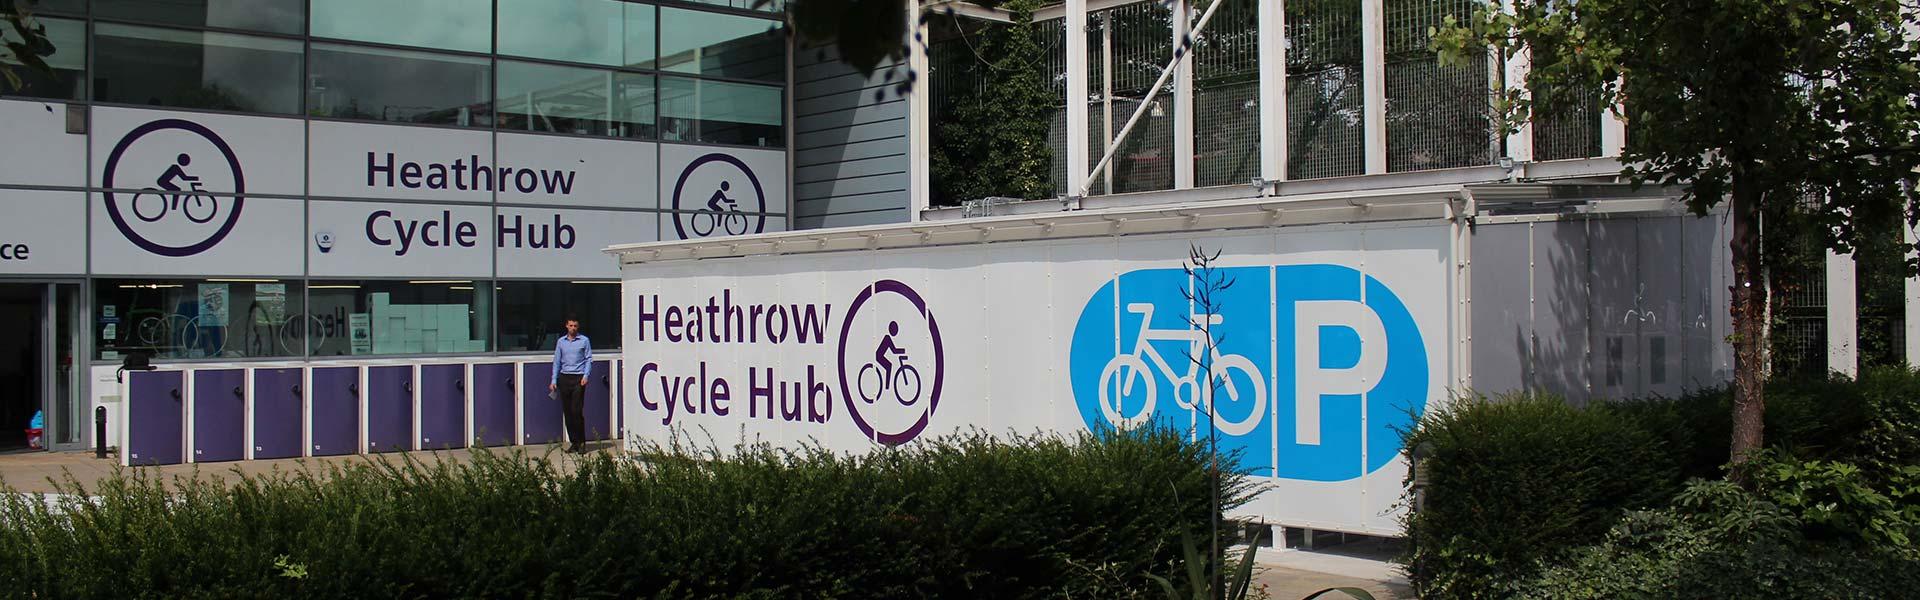 Heathrow-Cycle-hub---Cyclepods---1